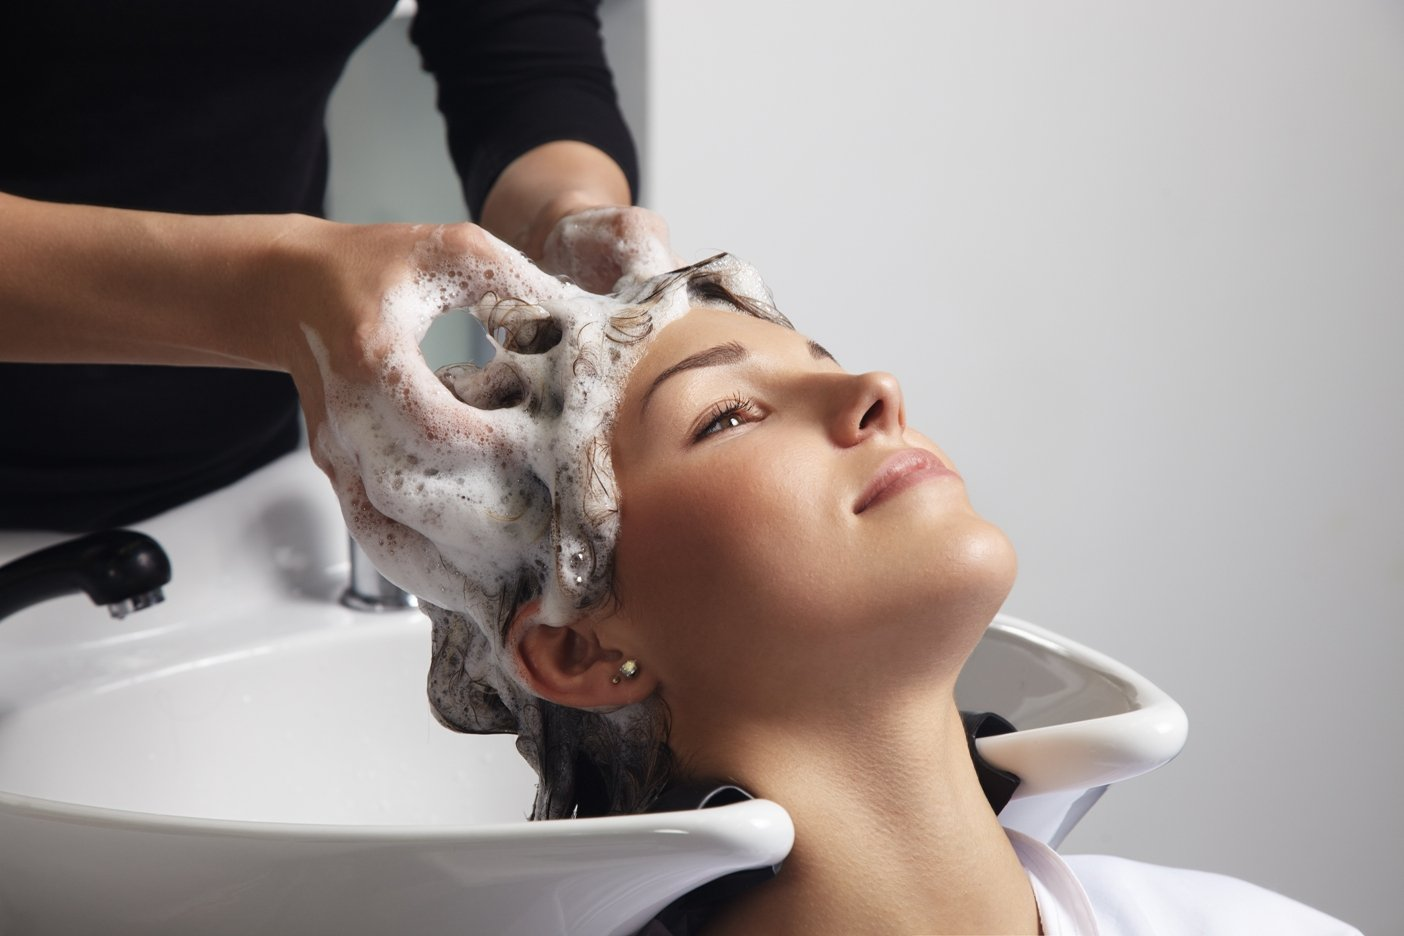 Спа процедуры для волос в салоне и в домашних условиях